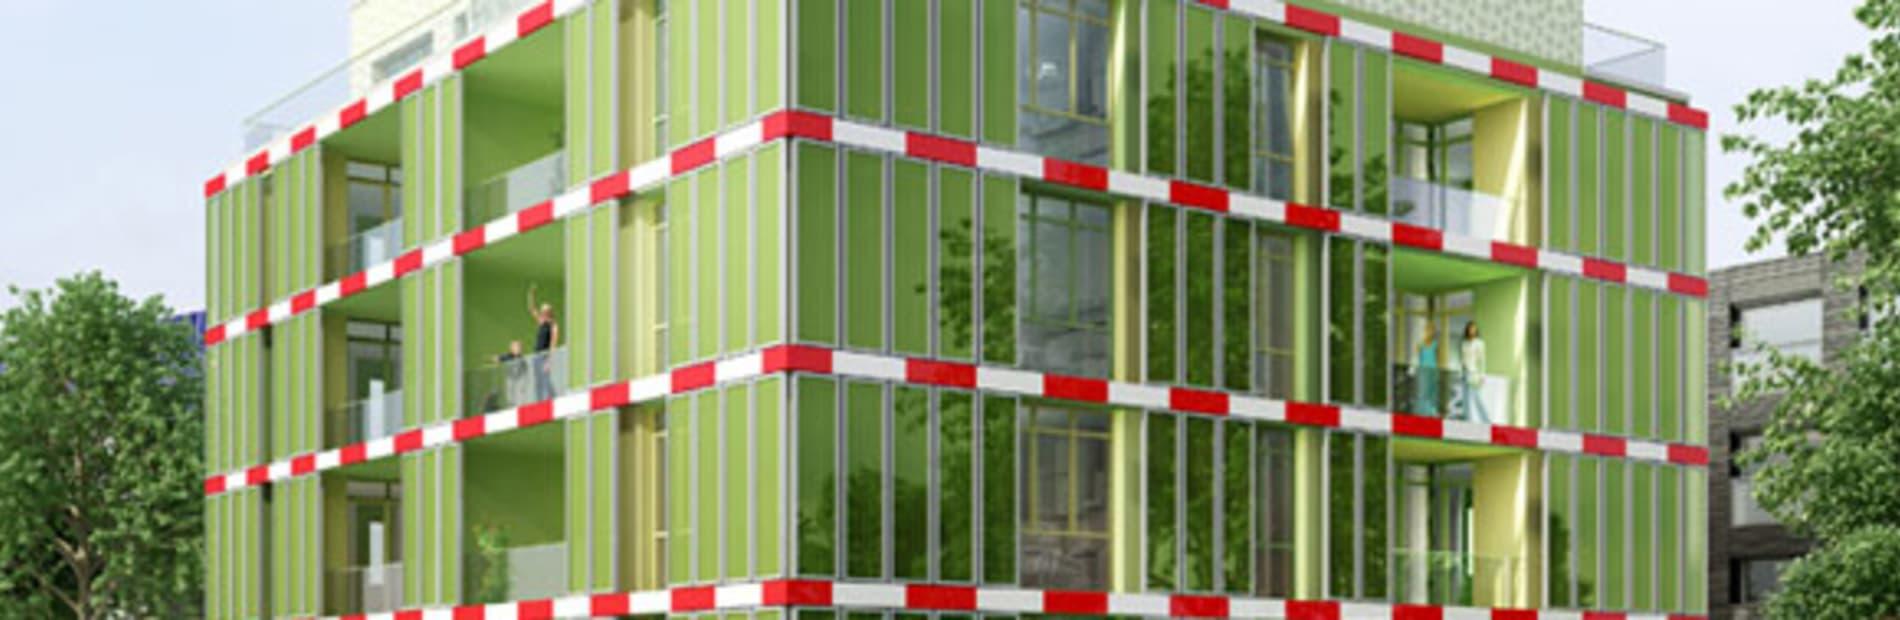 Green eco building